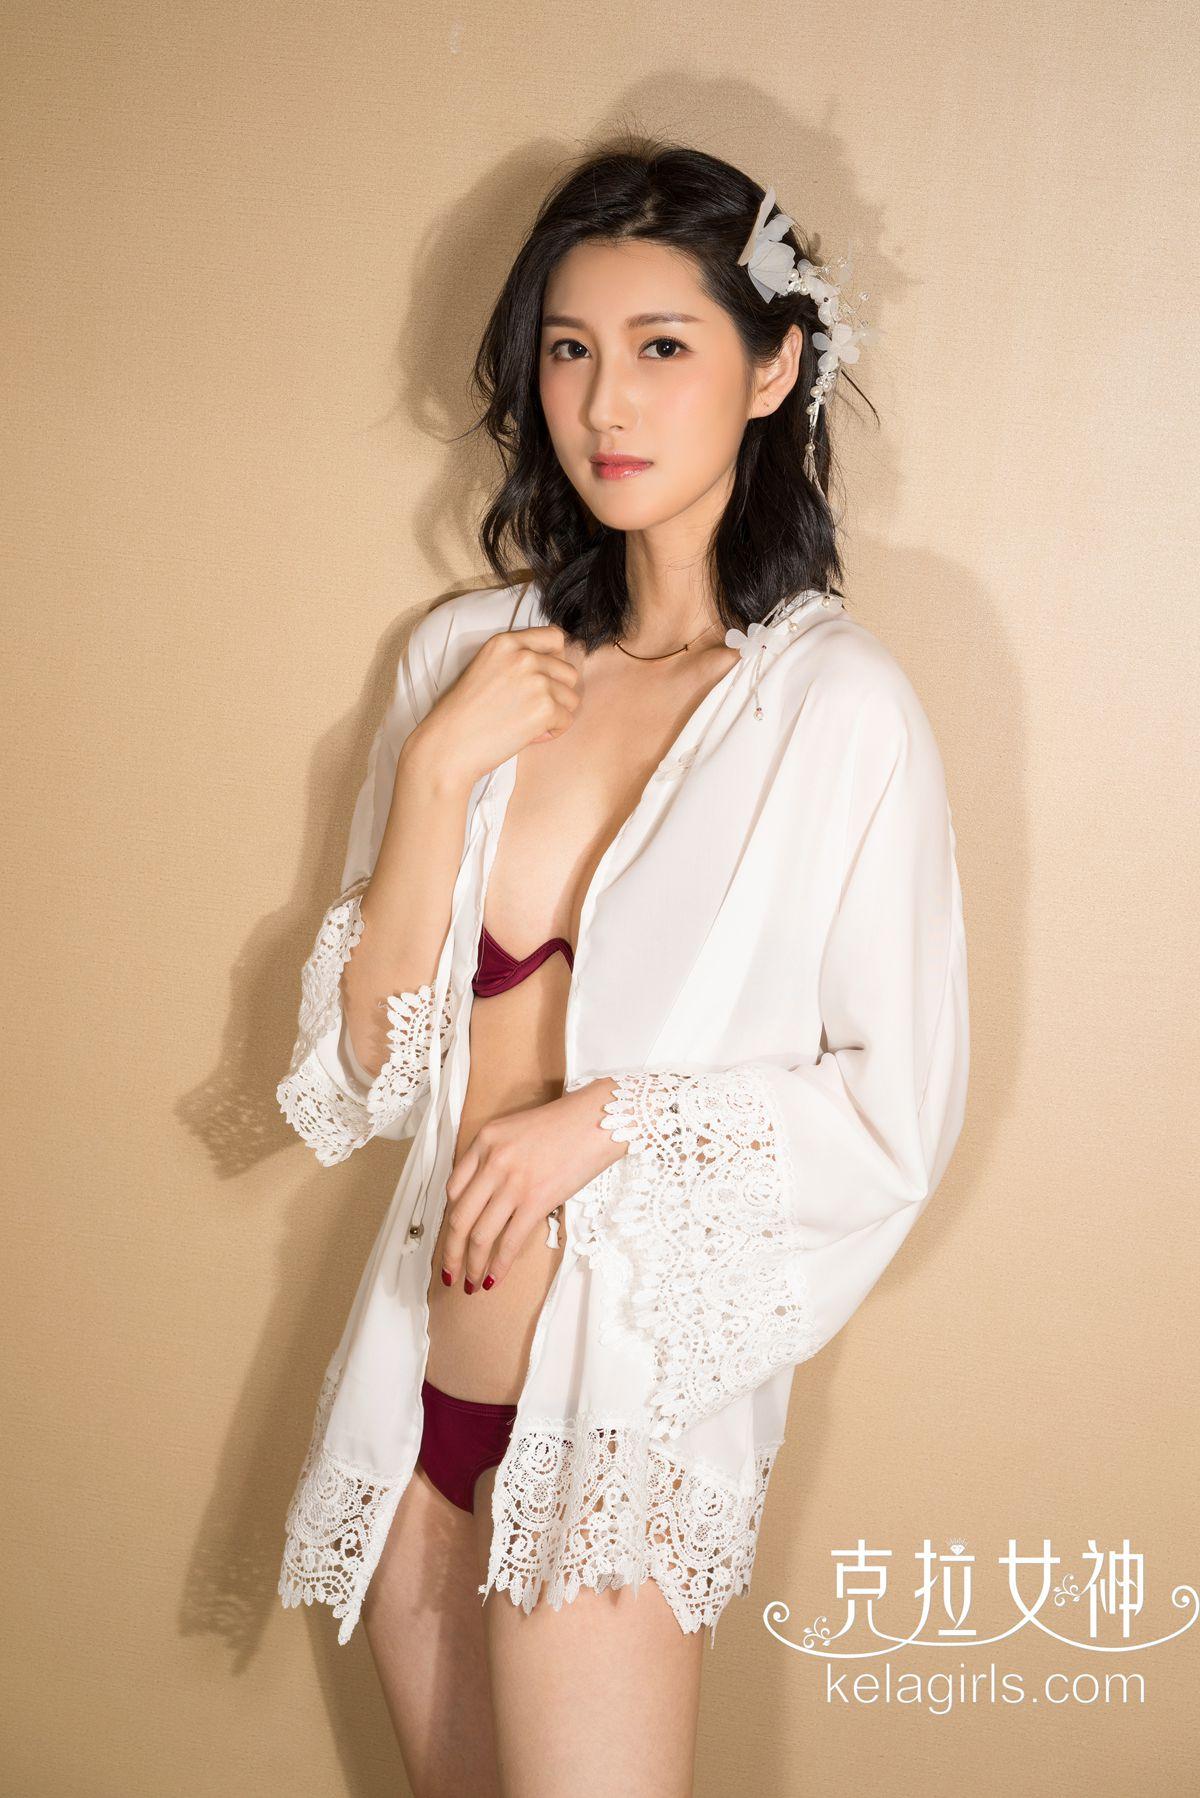 [KeLaGirls]克拉女神 2018.05.21 王睿 清凉一夏